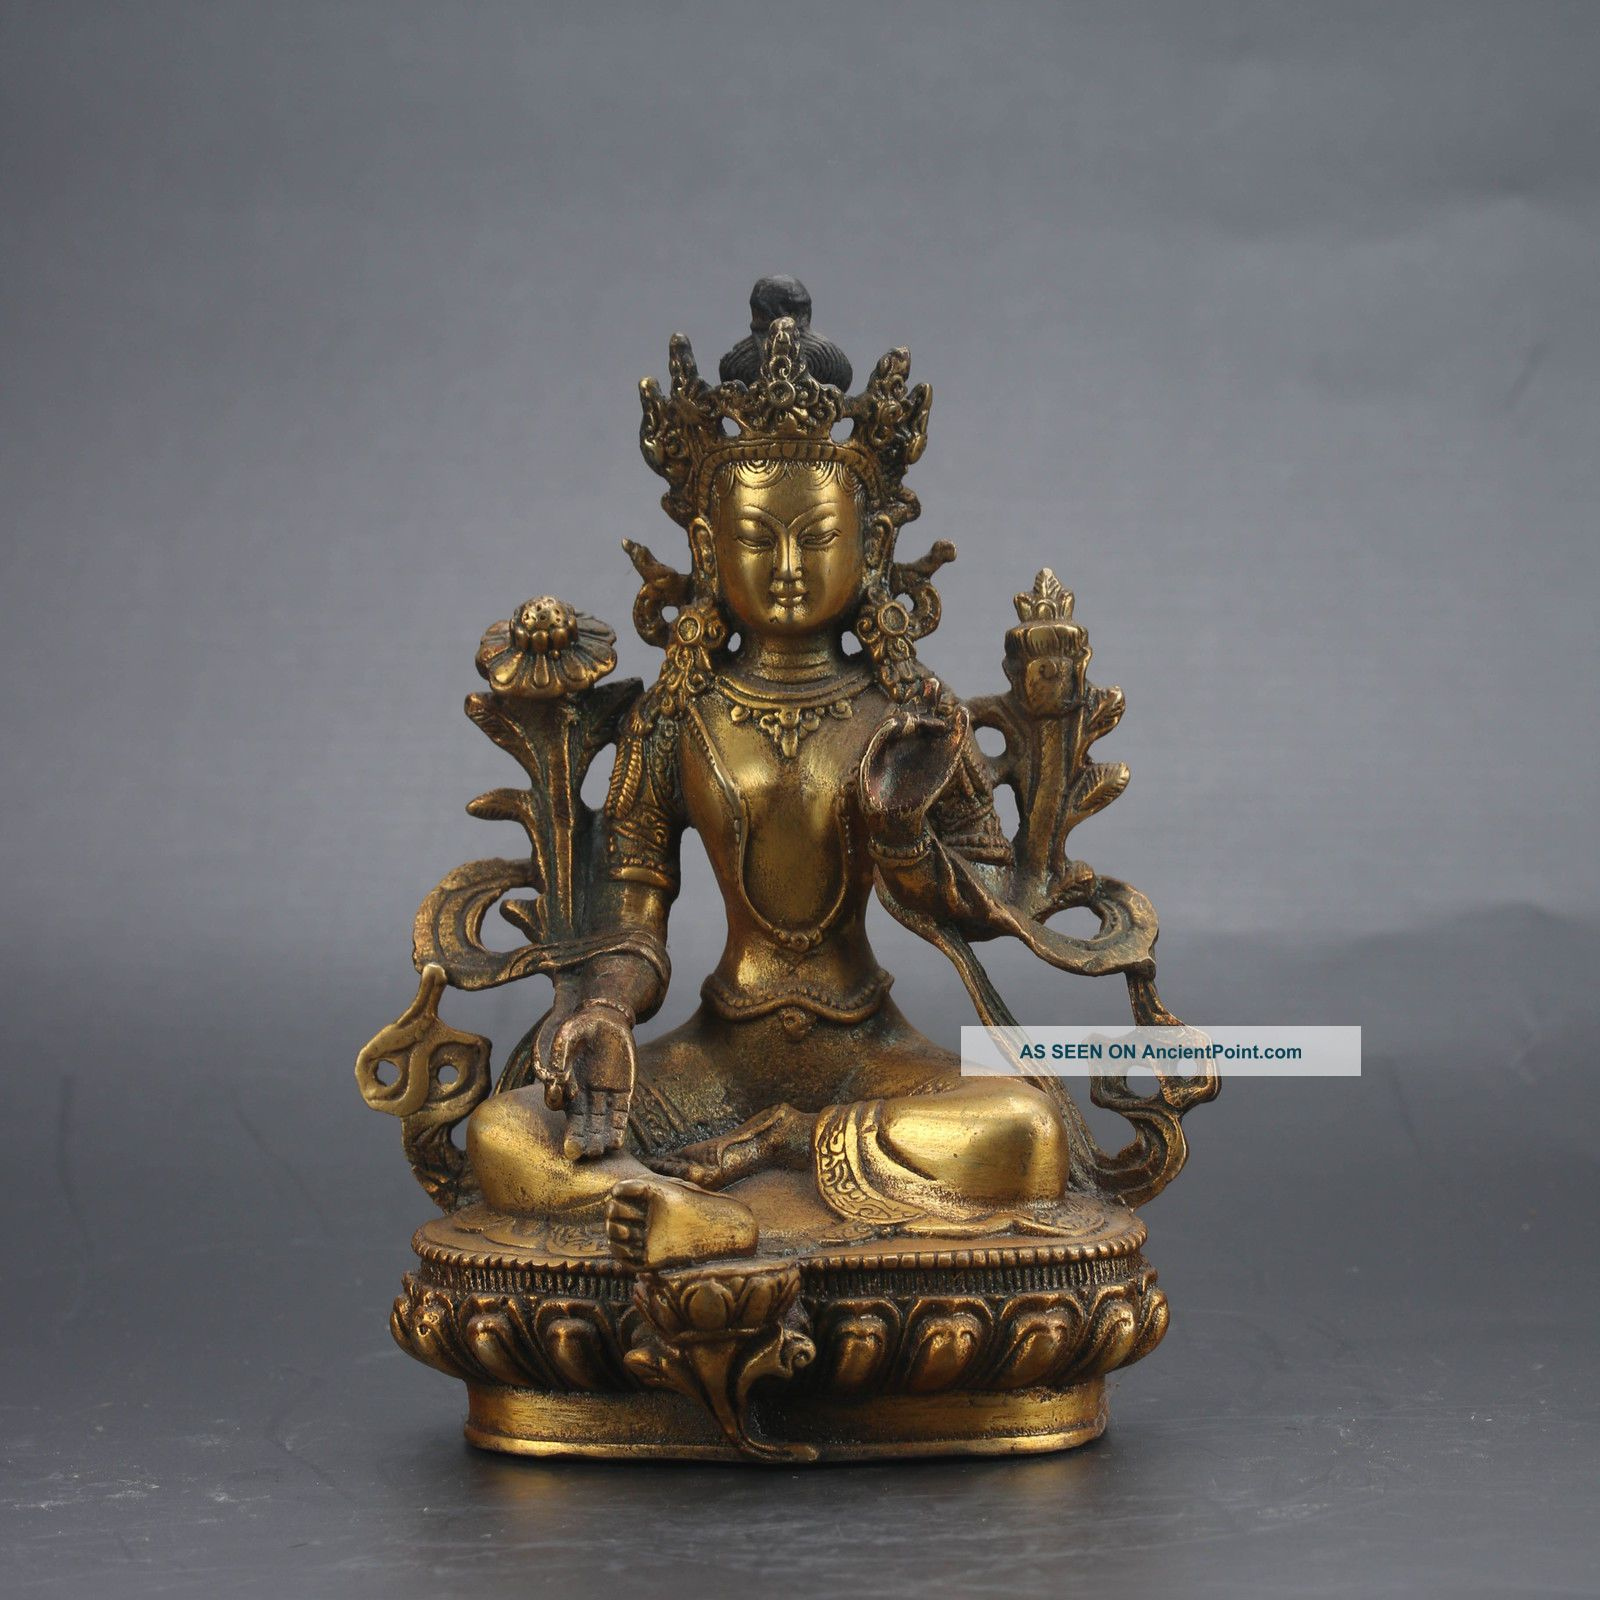 Chinese Brass Hand - Painted Tibetan Buddhist Statue - - Vajrasattva Gd6646 Buddha photo